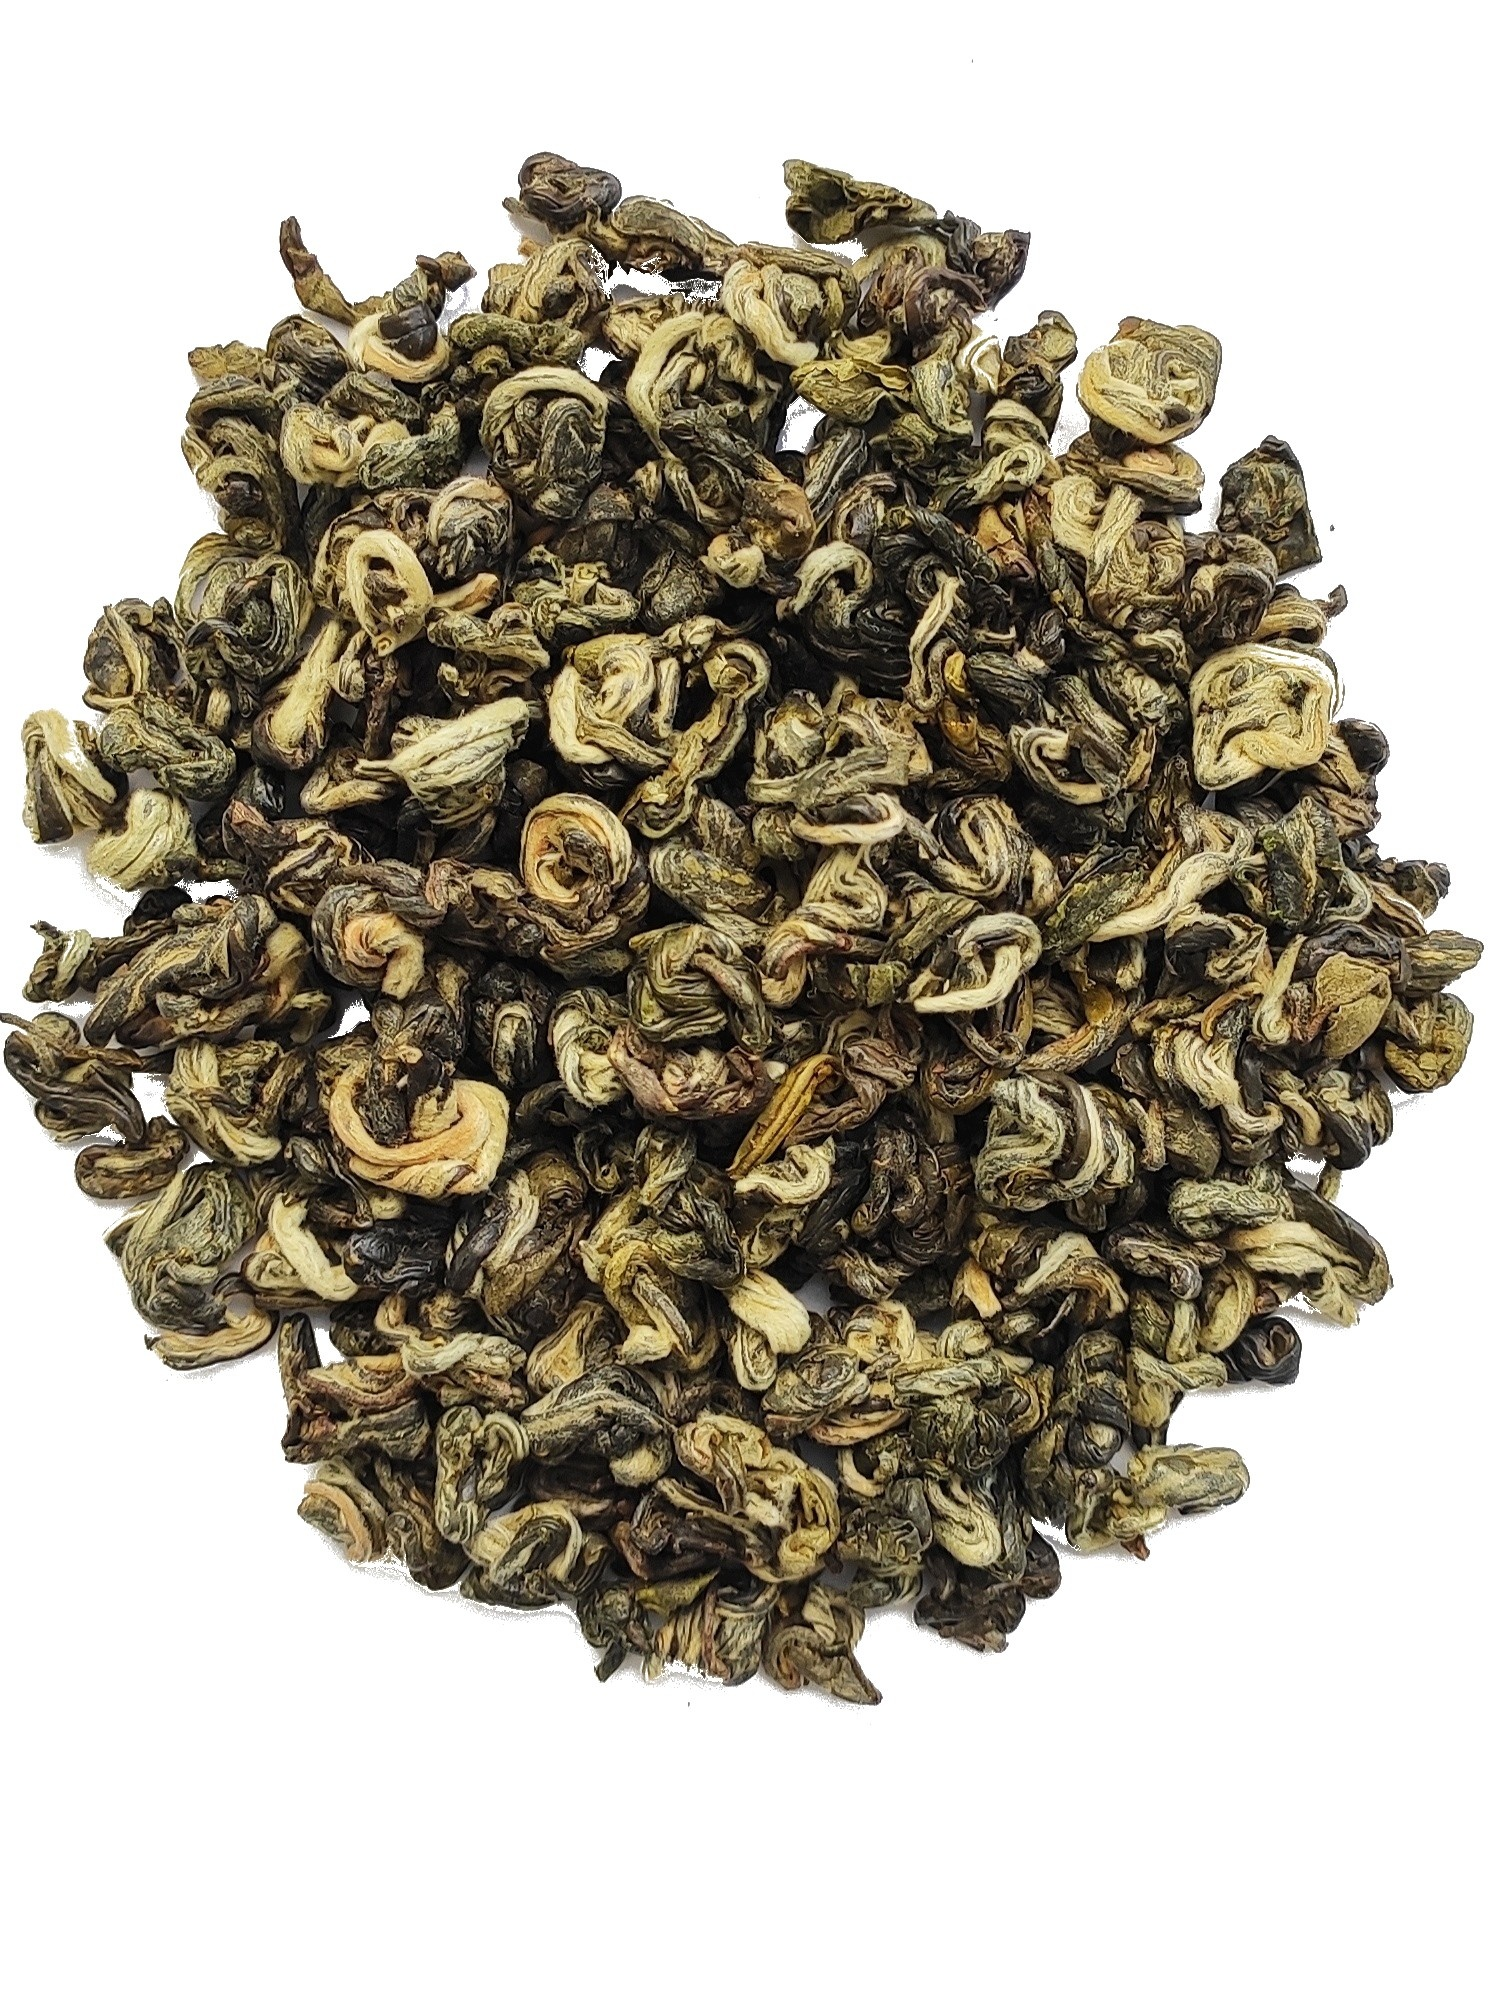 Grüner Tee Jade Snail-1